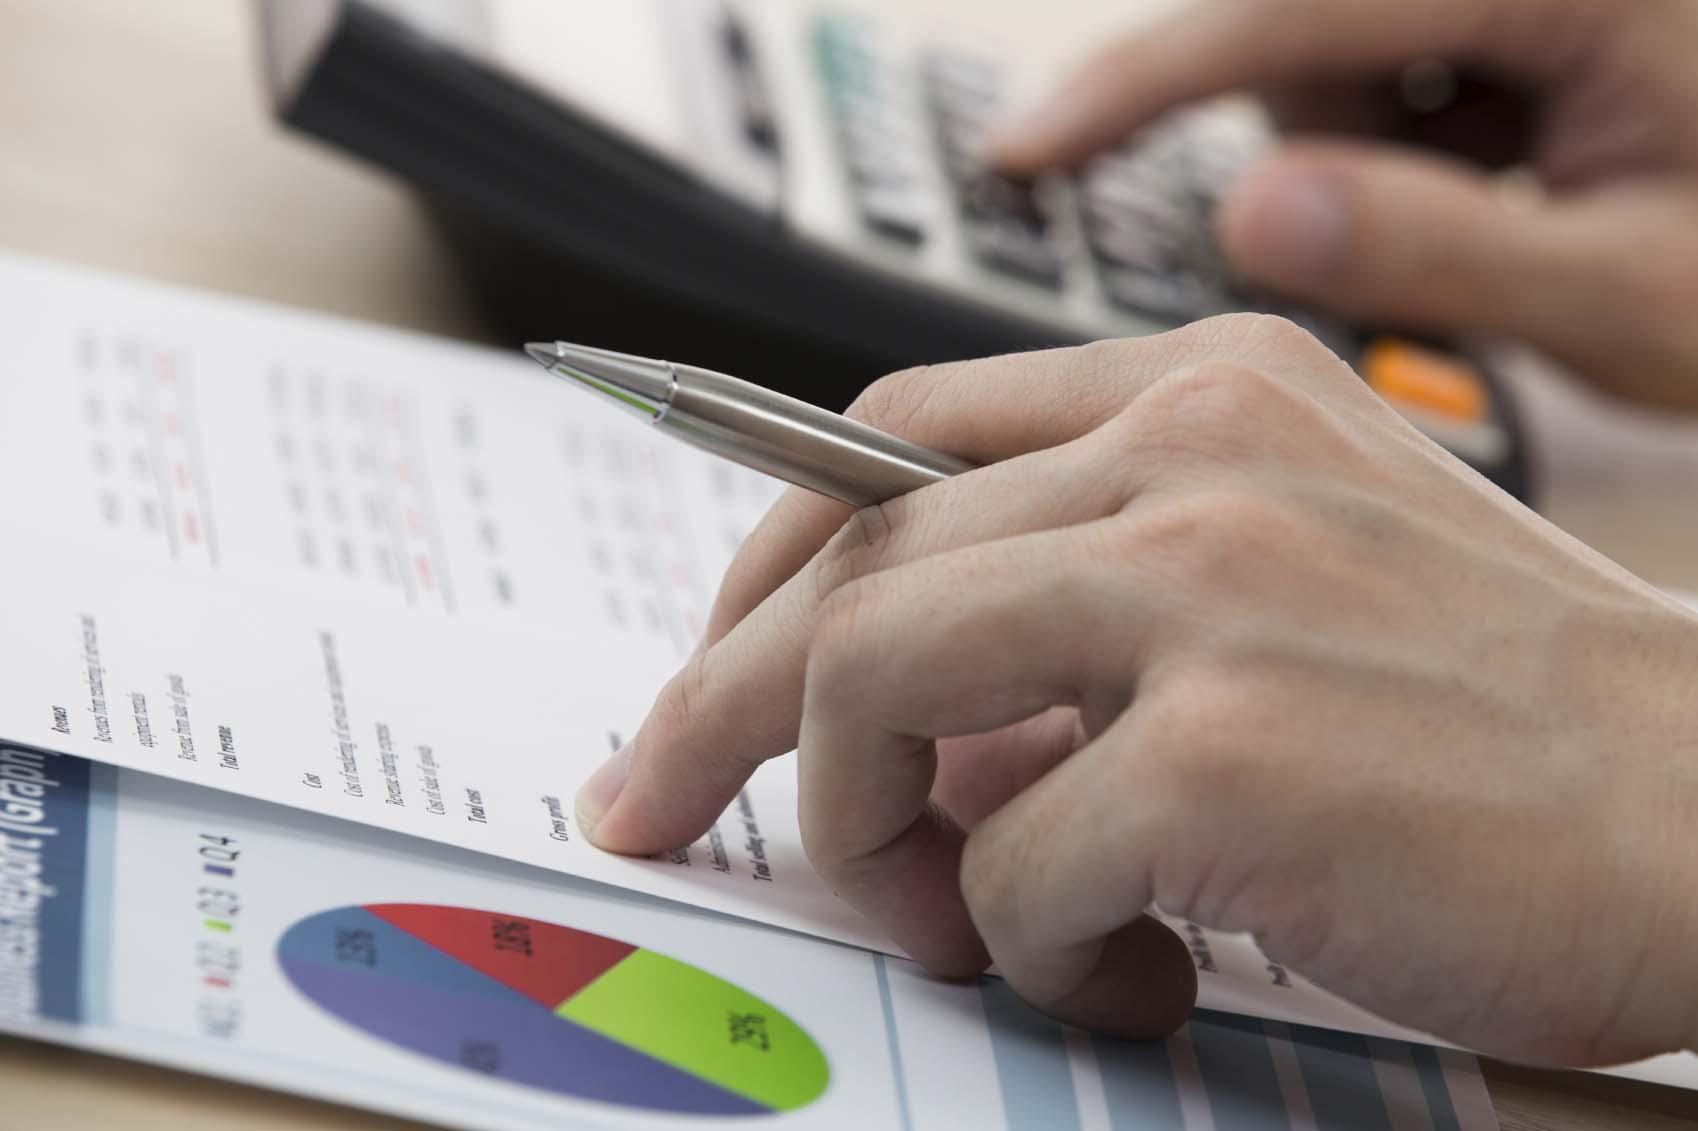 Assurance crédit immobilier : Annuler son assurance